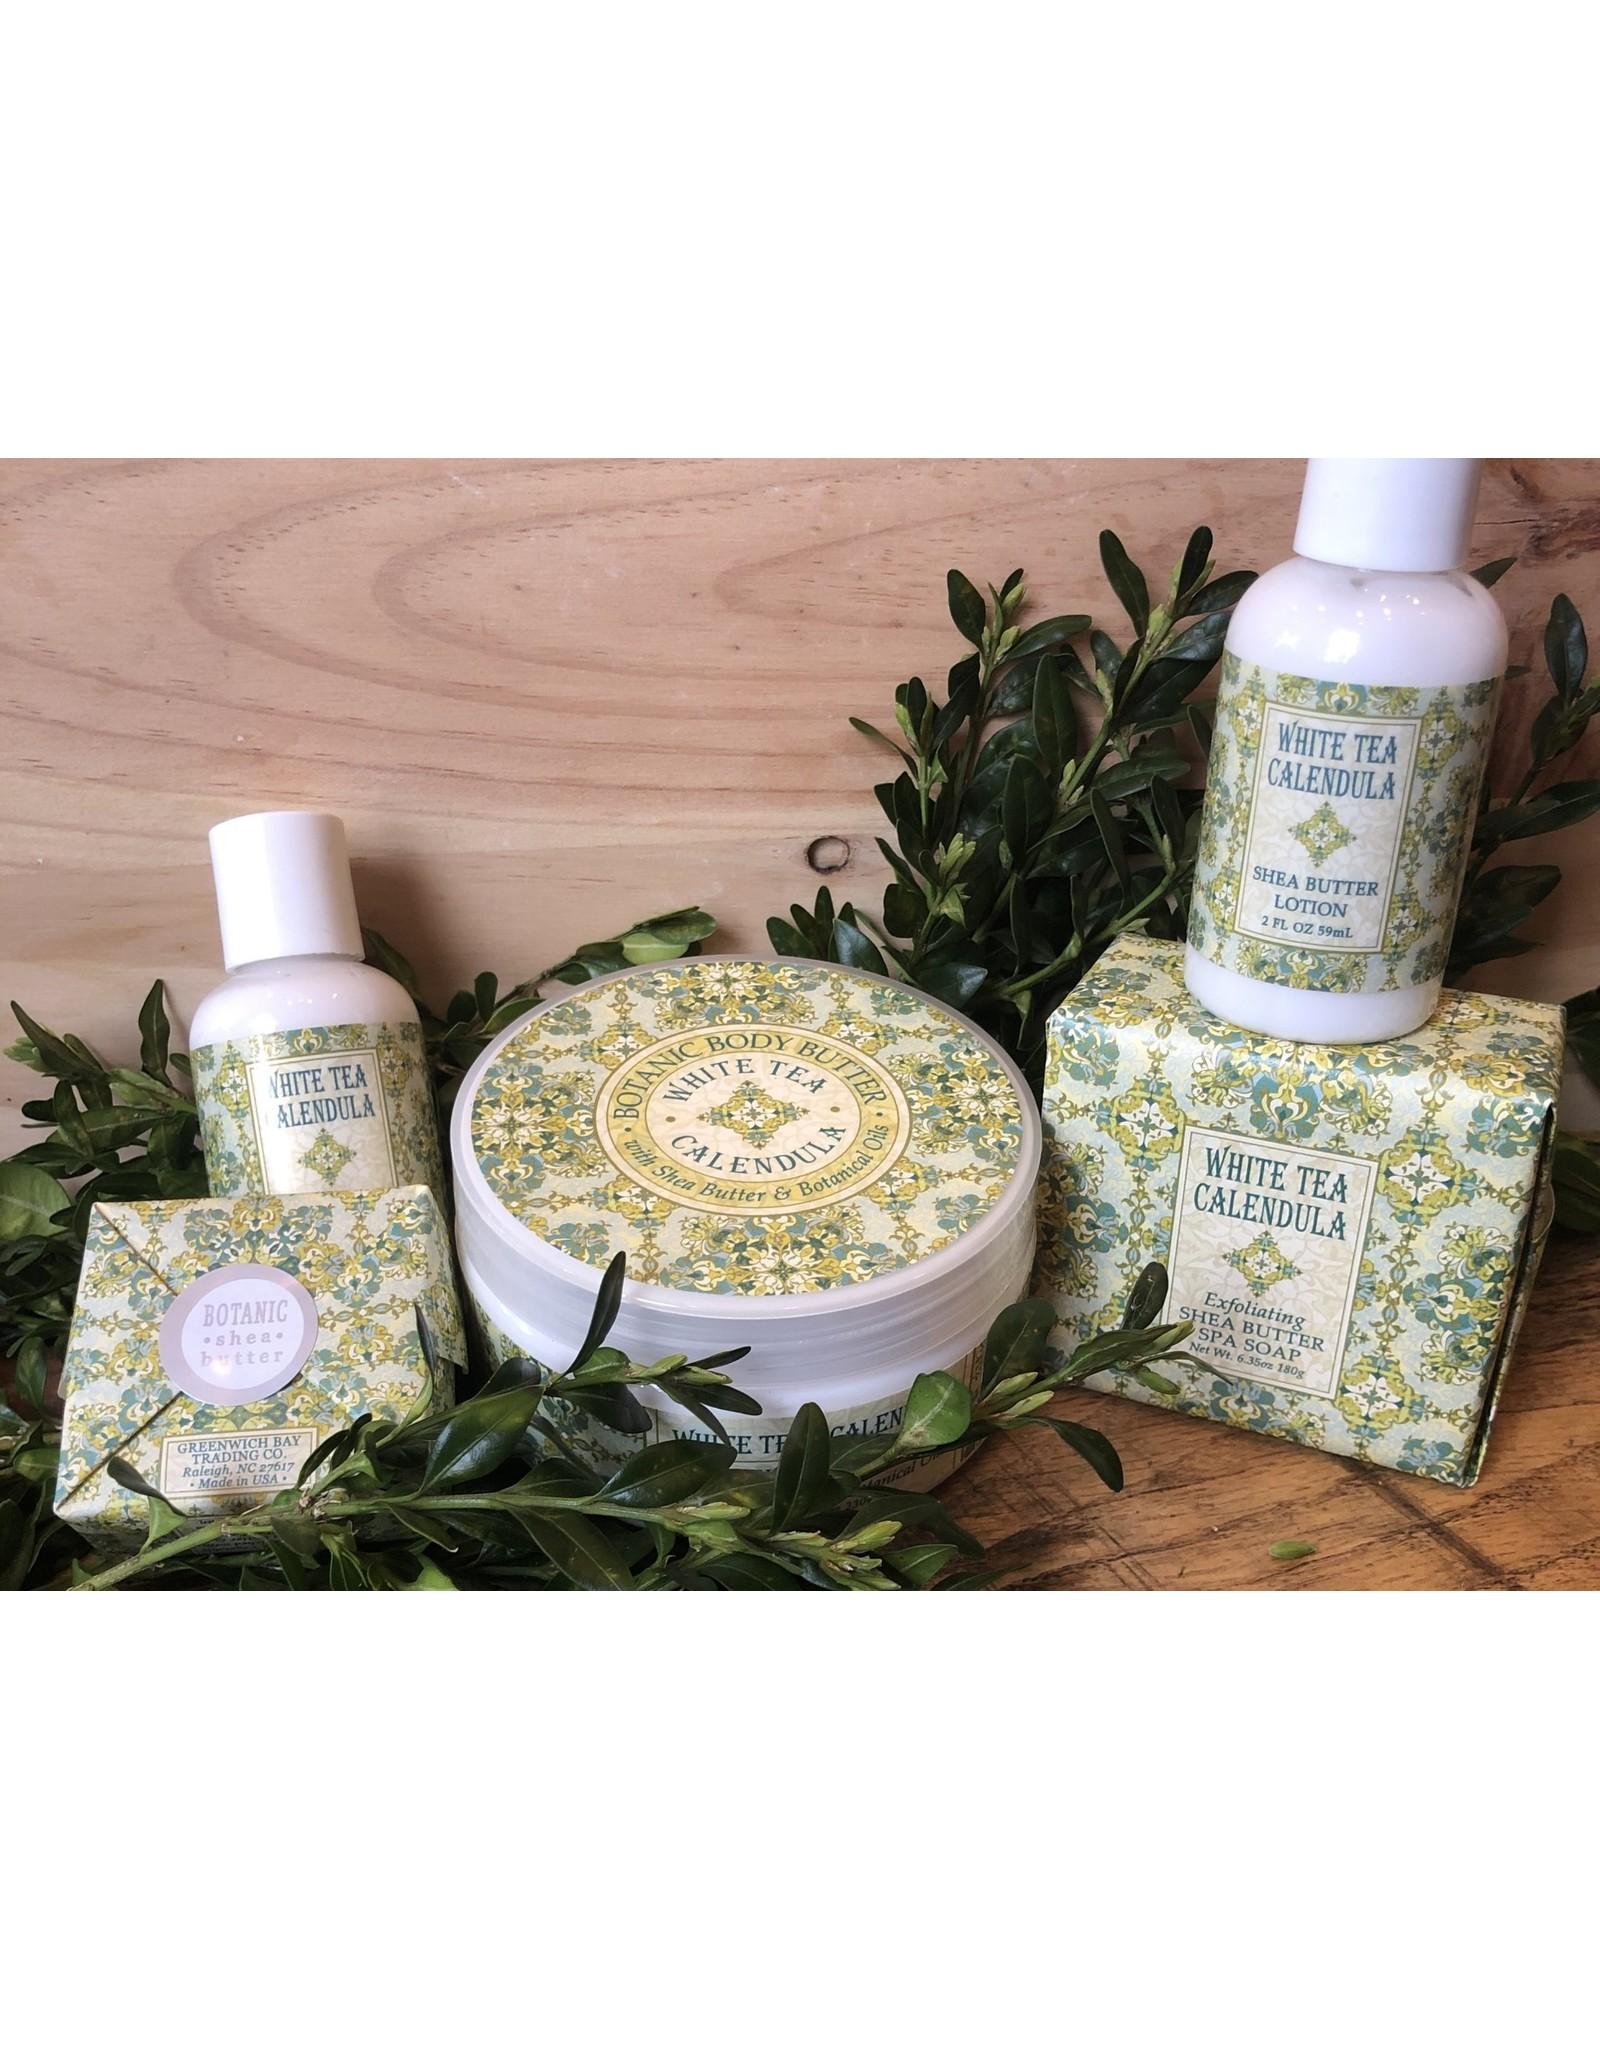 White Calendula Spa Products